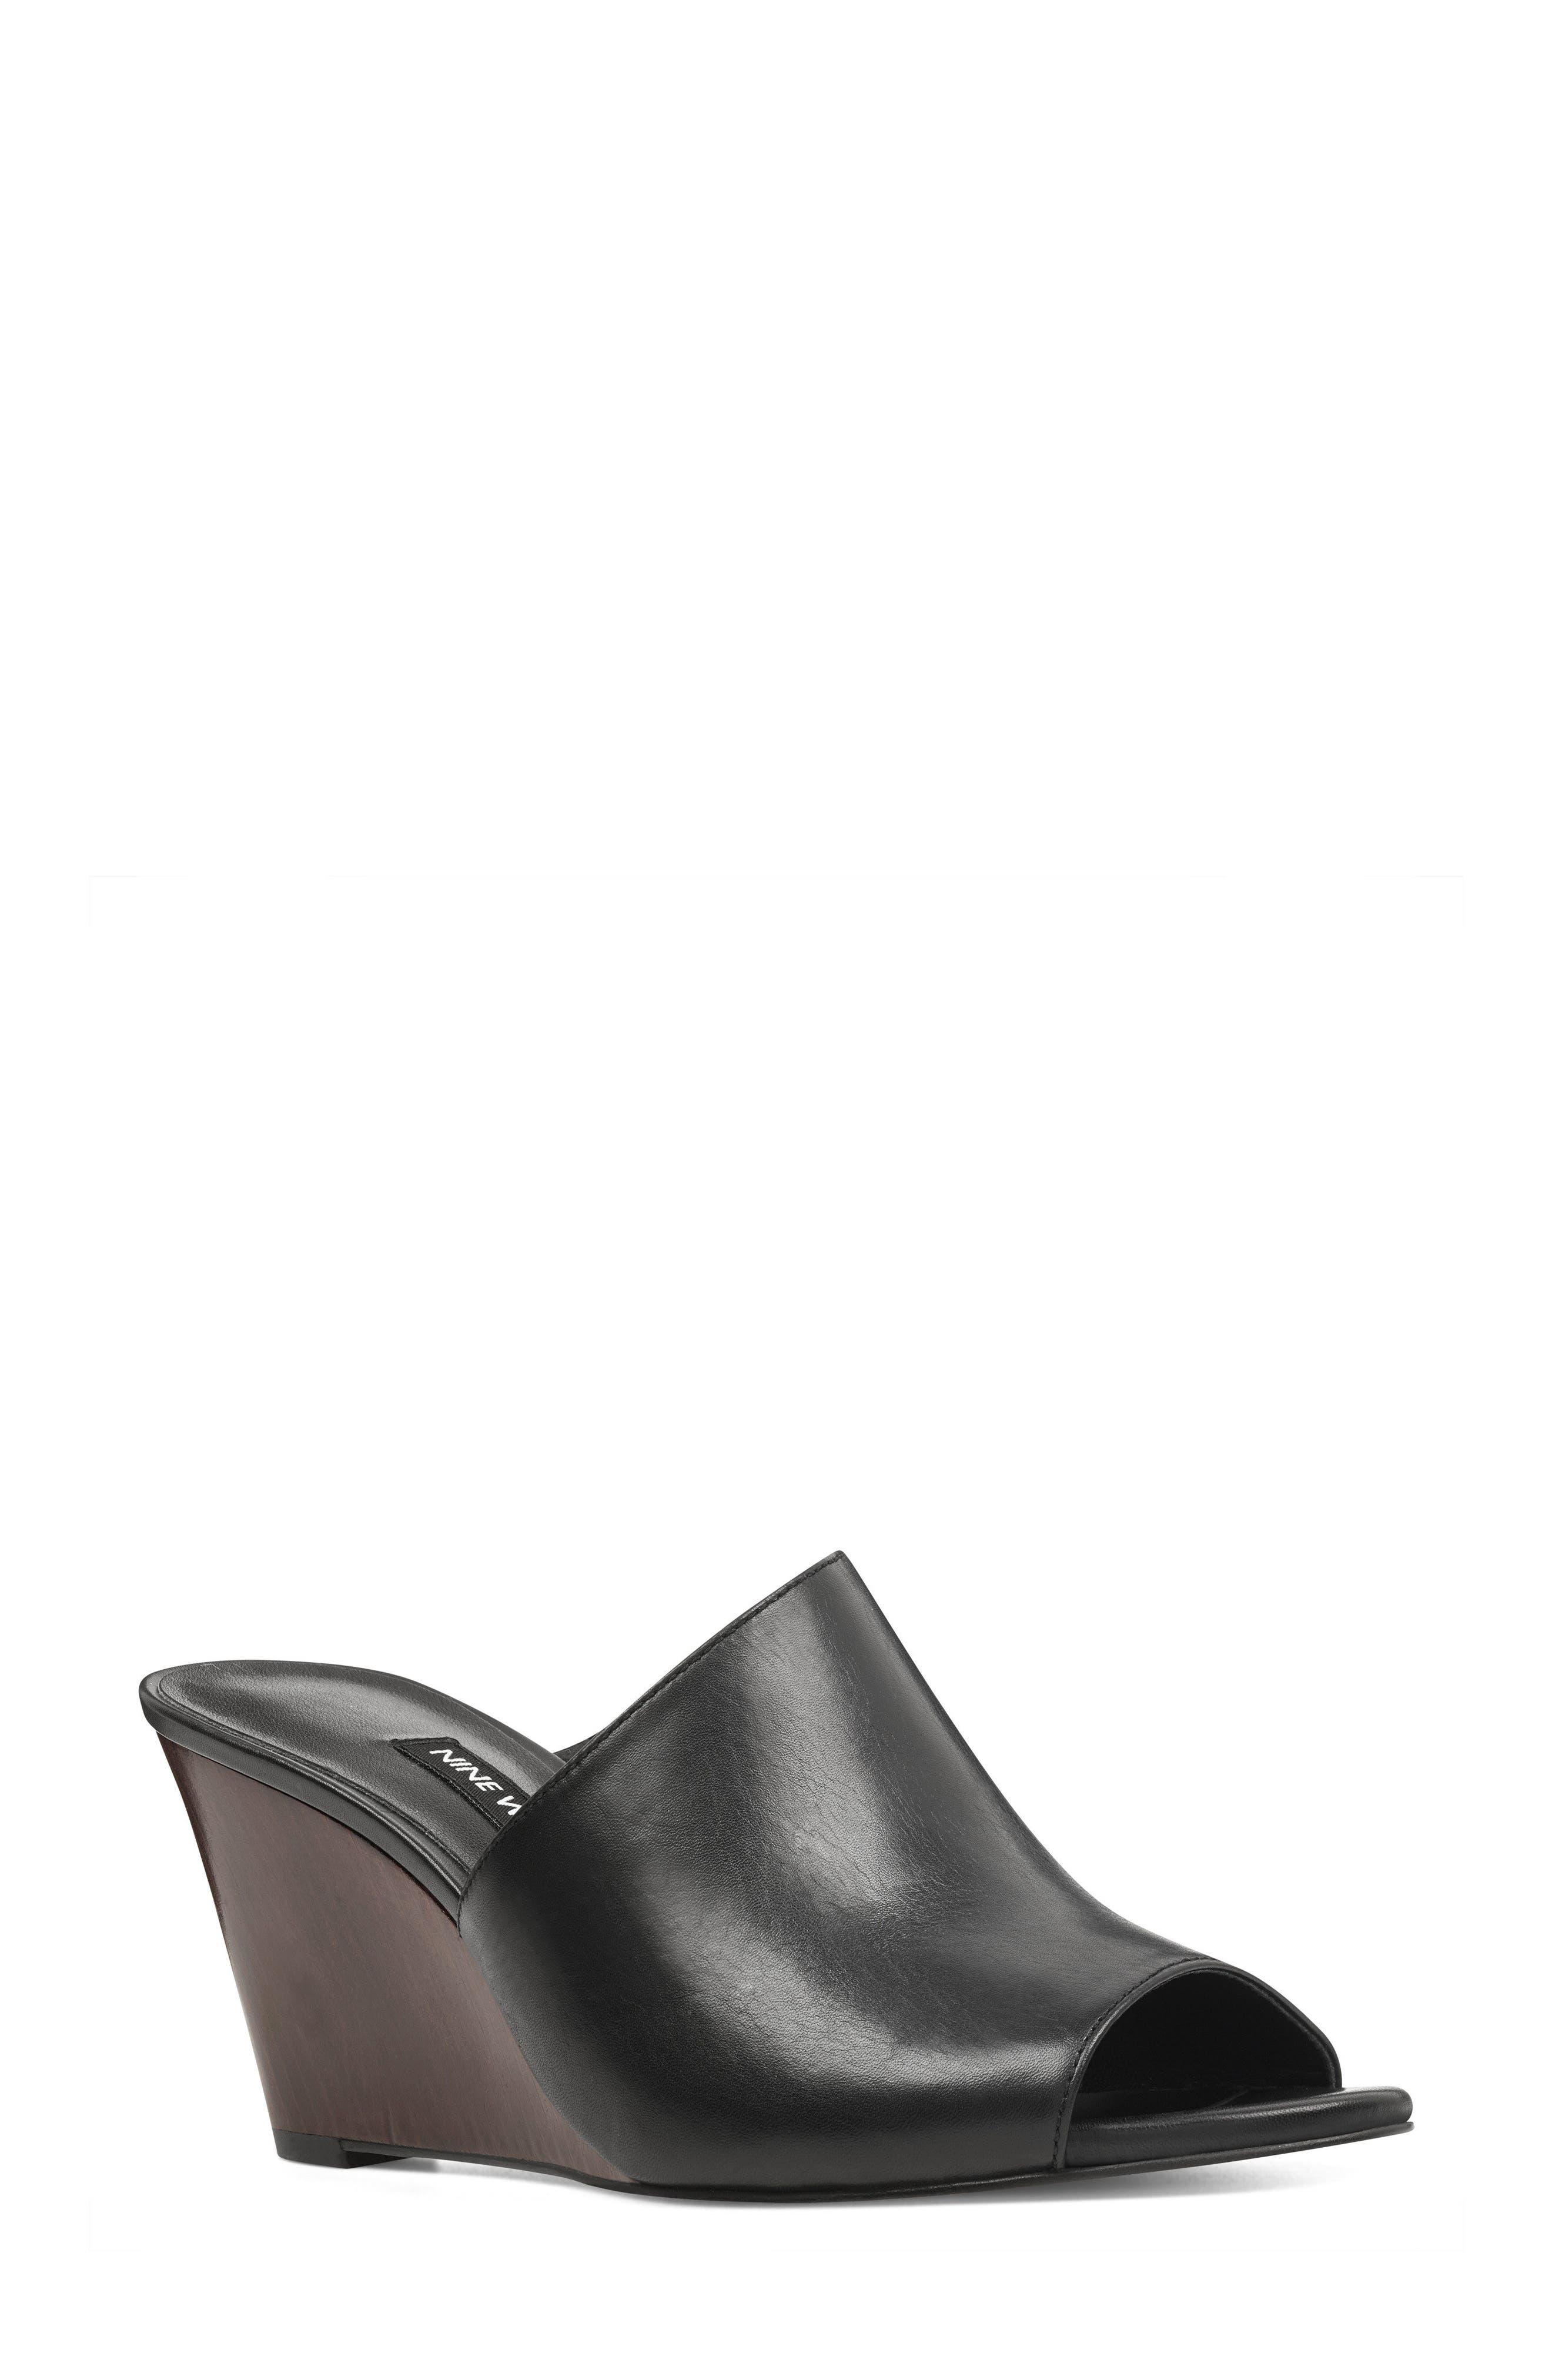 Janissah Wedge,                             Main thumbnail 1, color,                             Black Leather